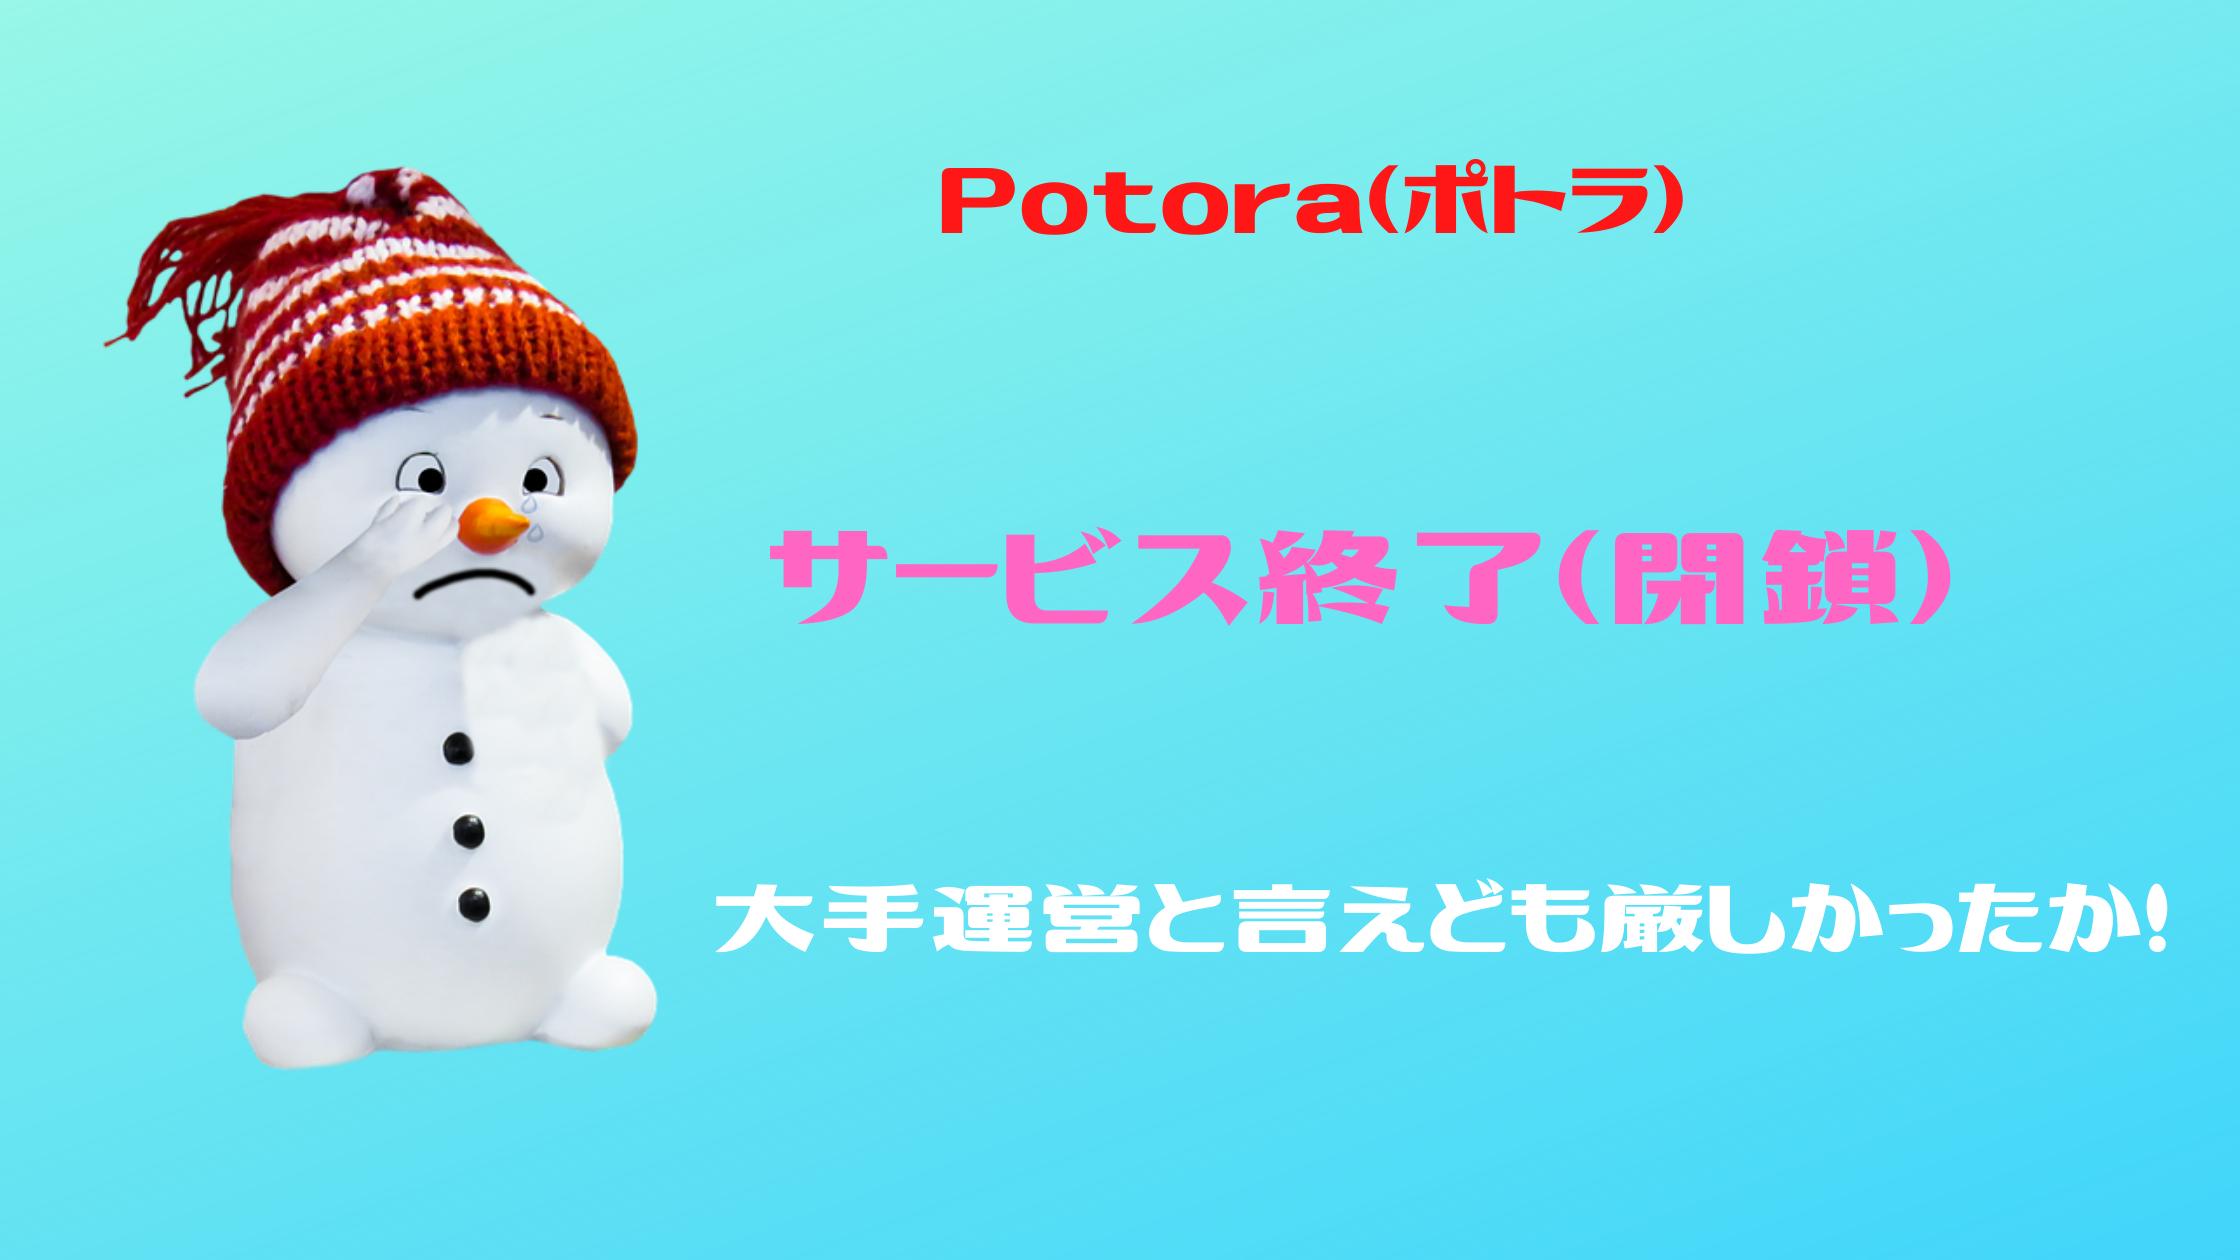 Potora(ポトラ) サービス終了。終了までの日程を確認しよう